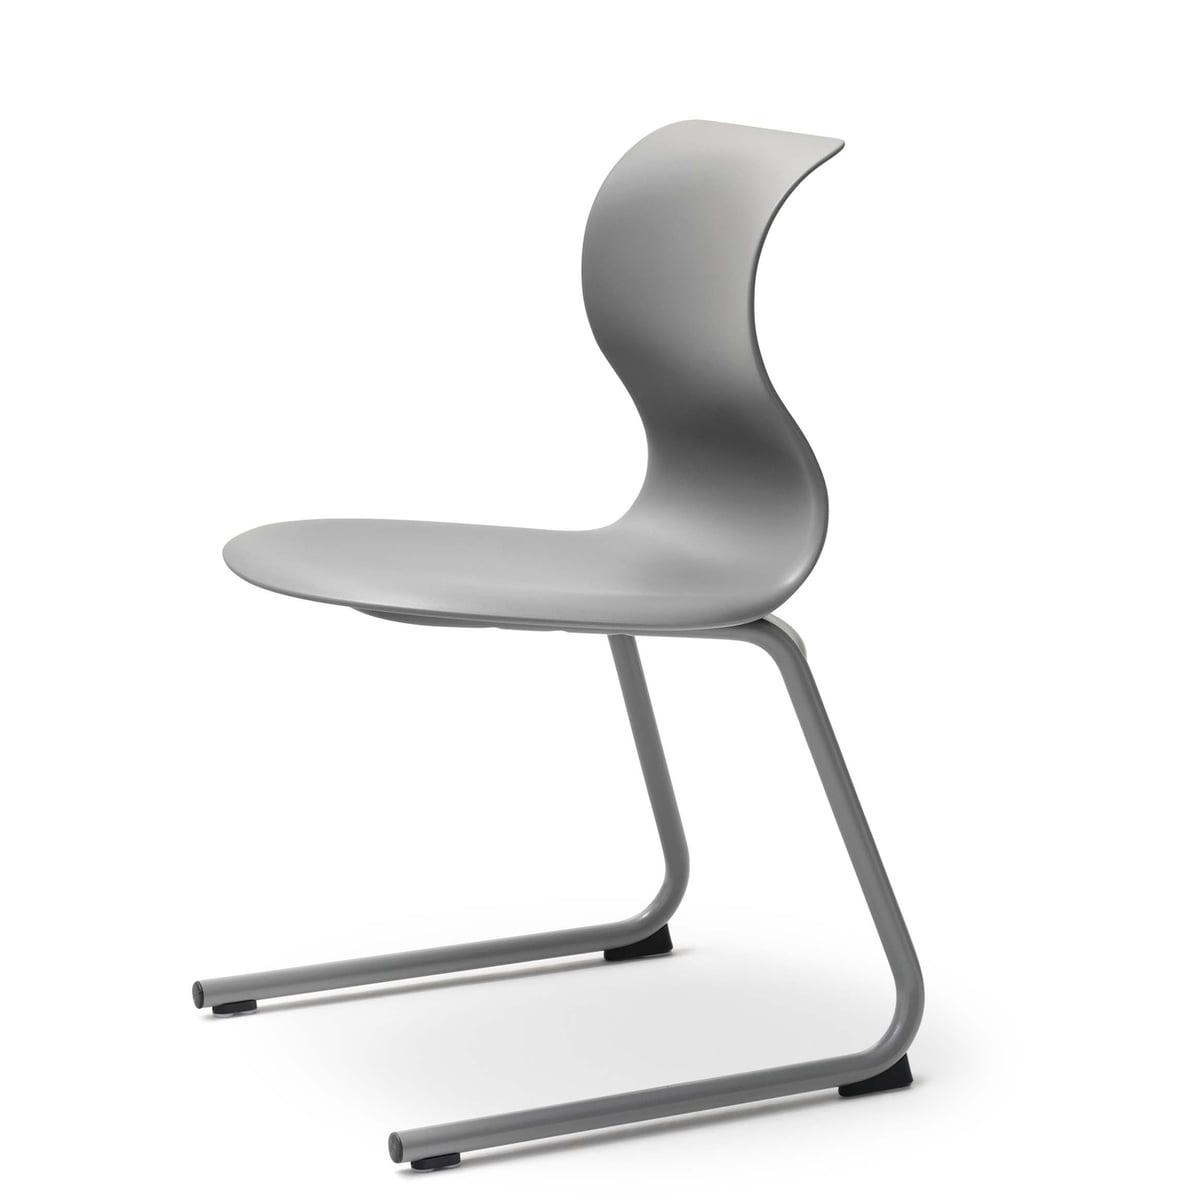 fl totto pro stuhl c gestell. Black Bedroom Furniture Sets. Home Design Ideas